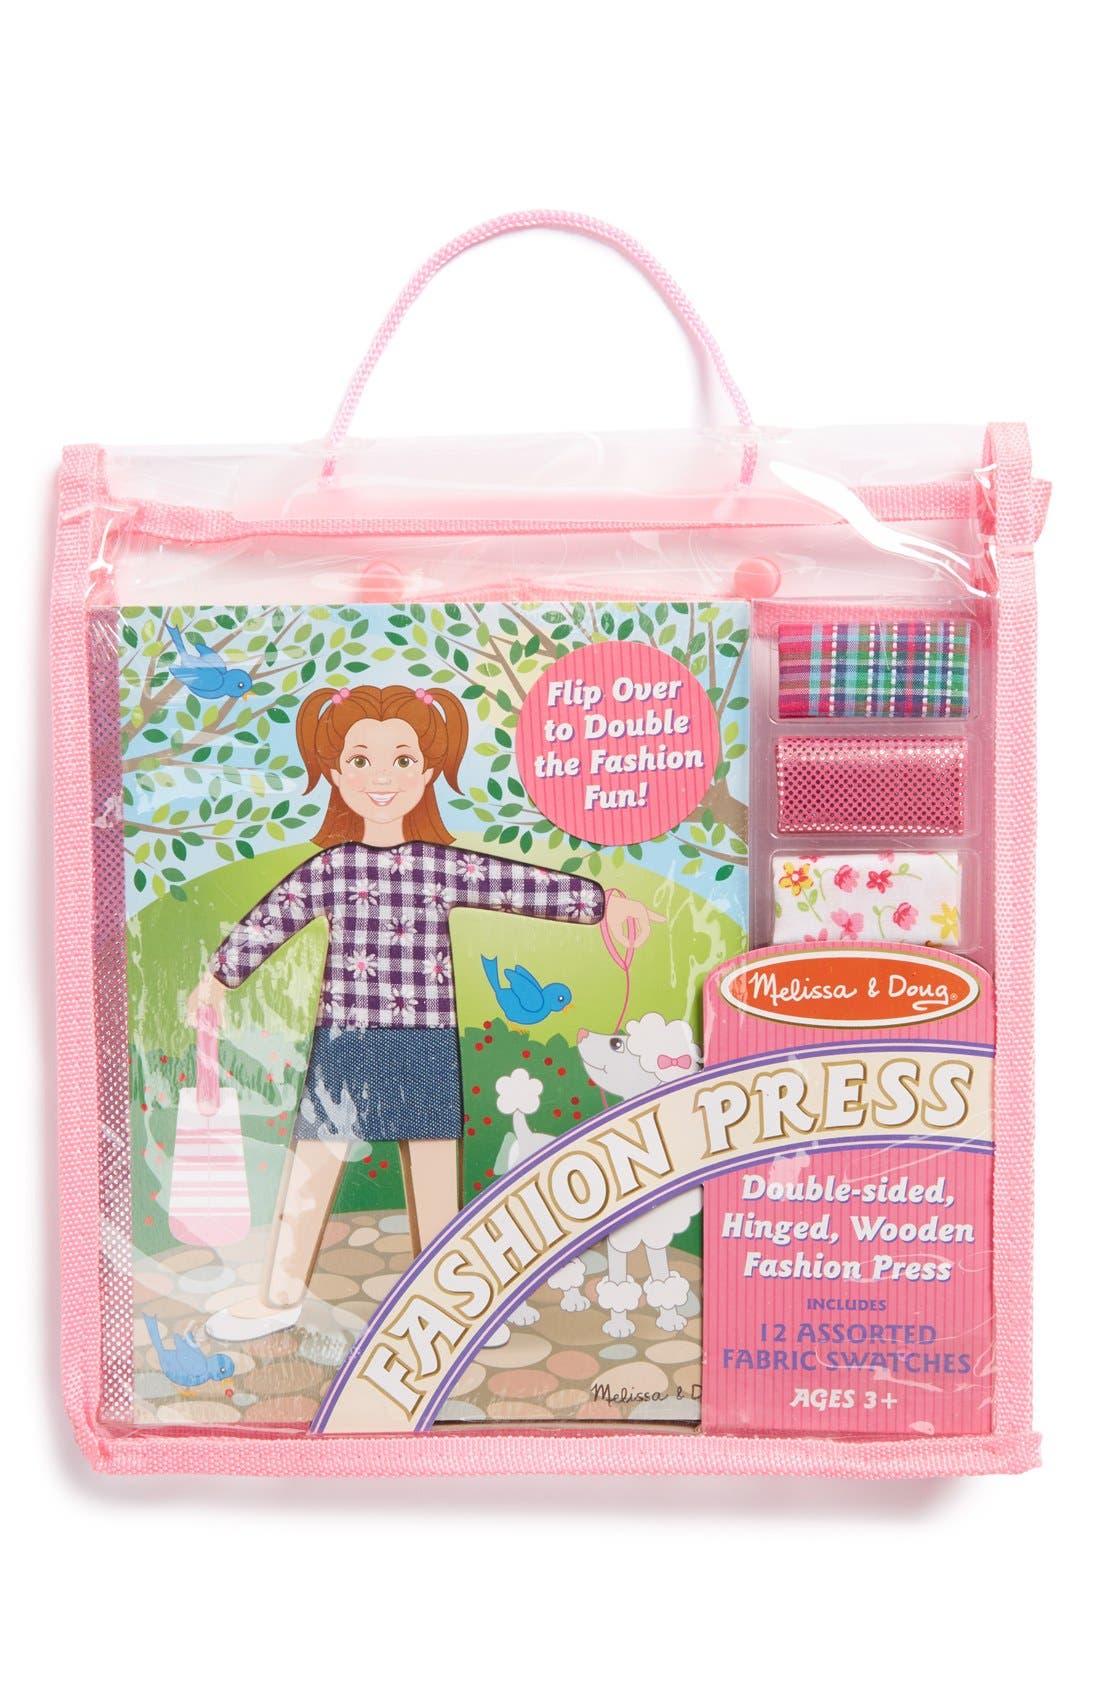 'Fashion Press' Kit,                             Main thumbnail 1, color,                             000